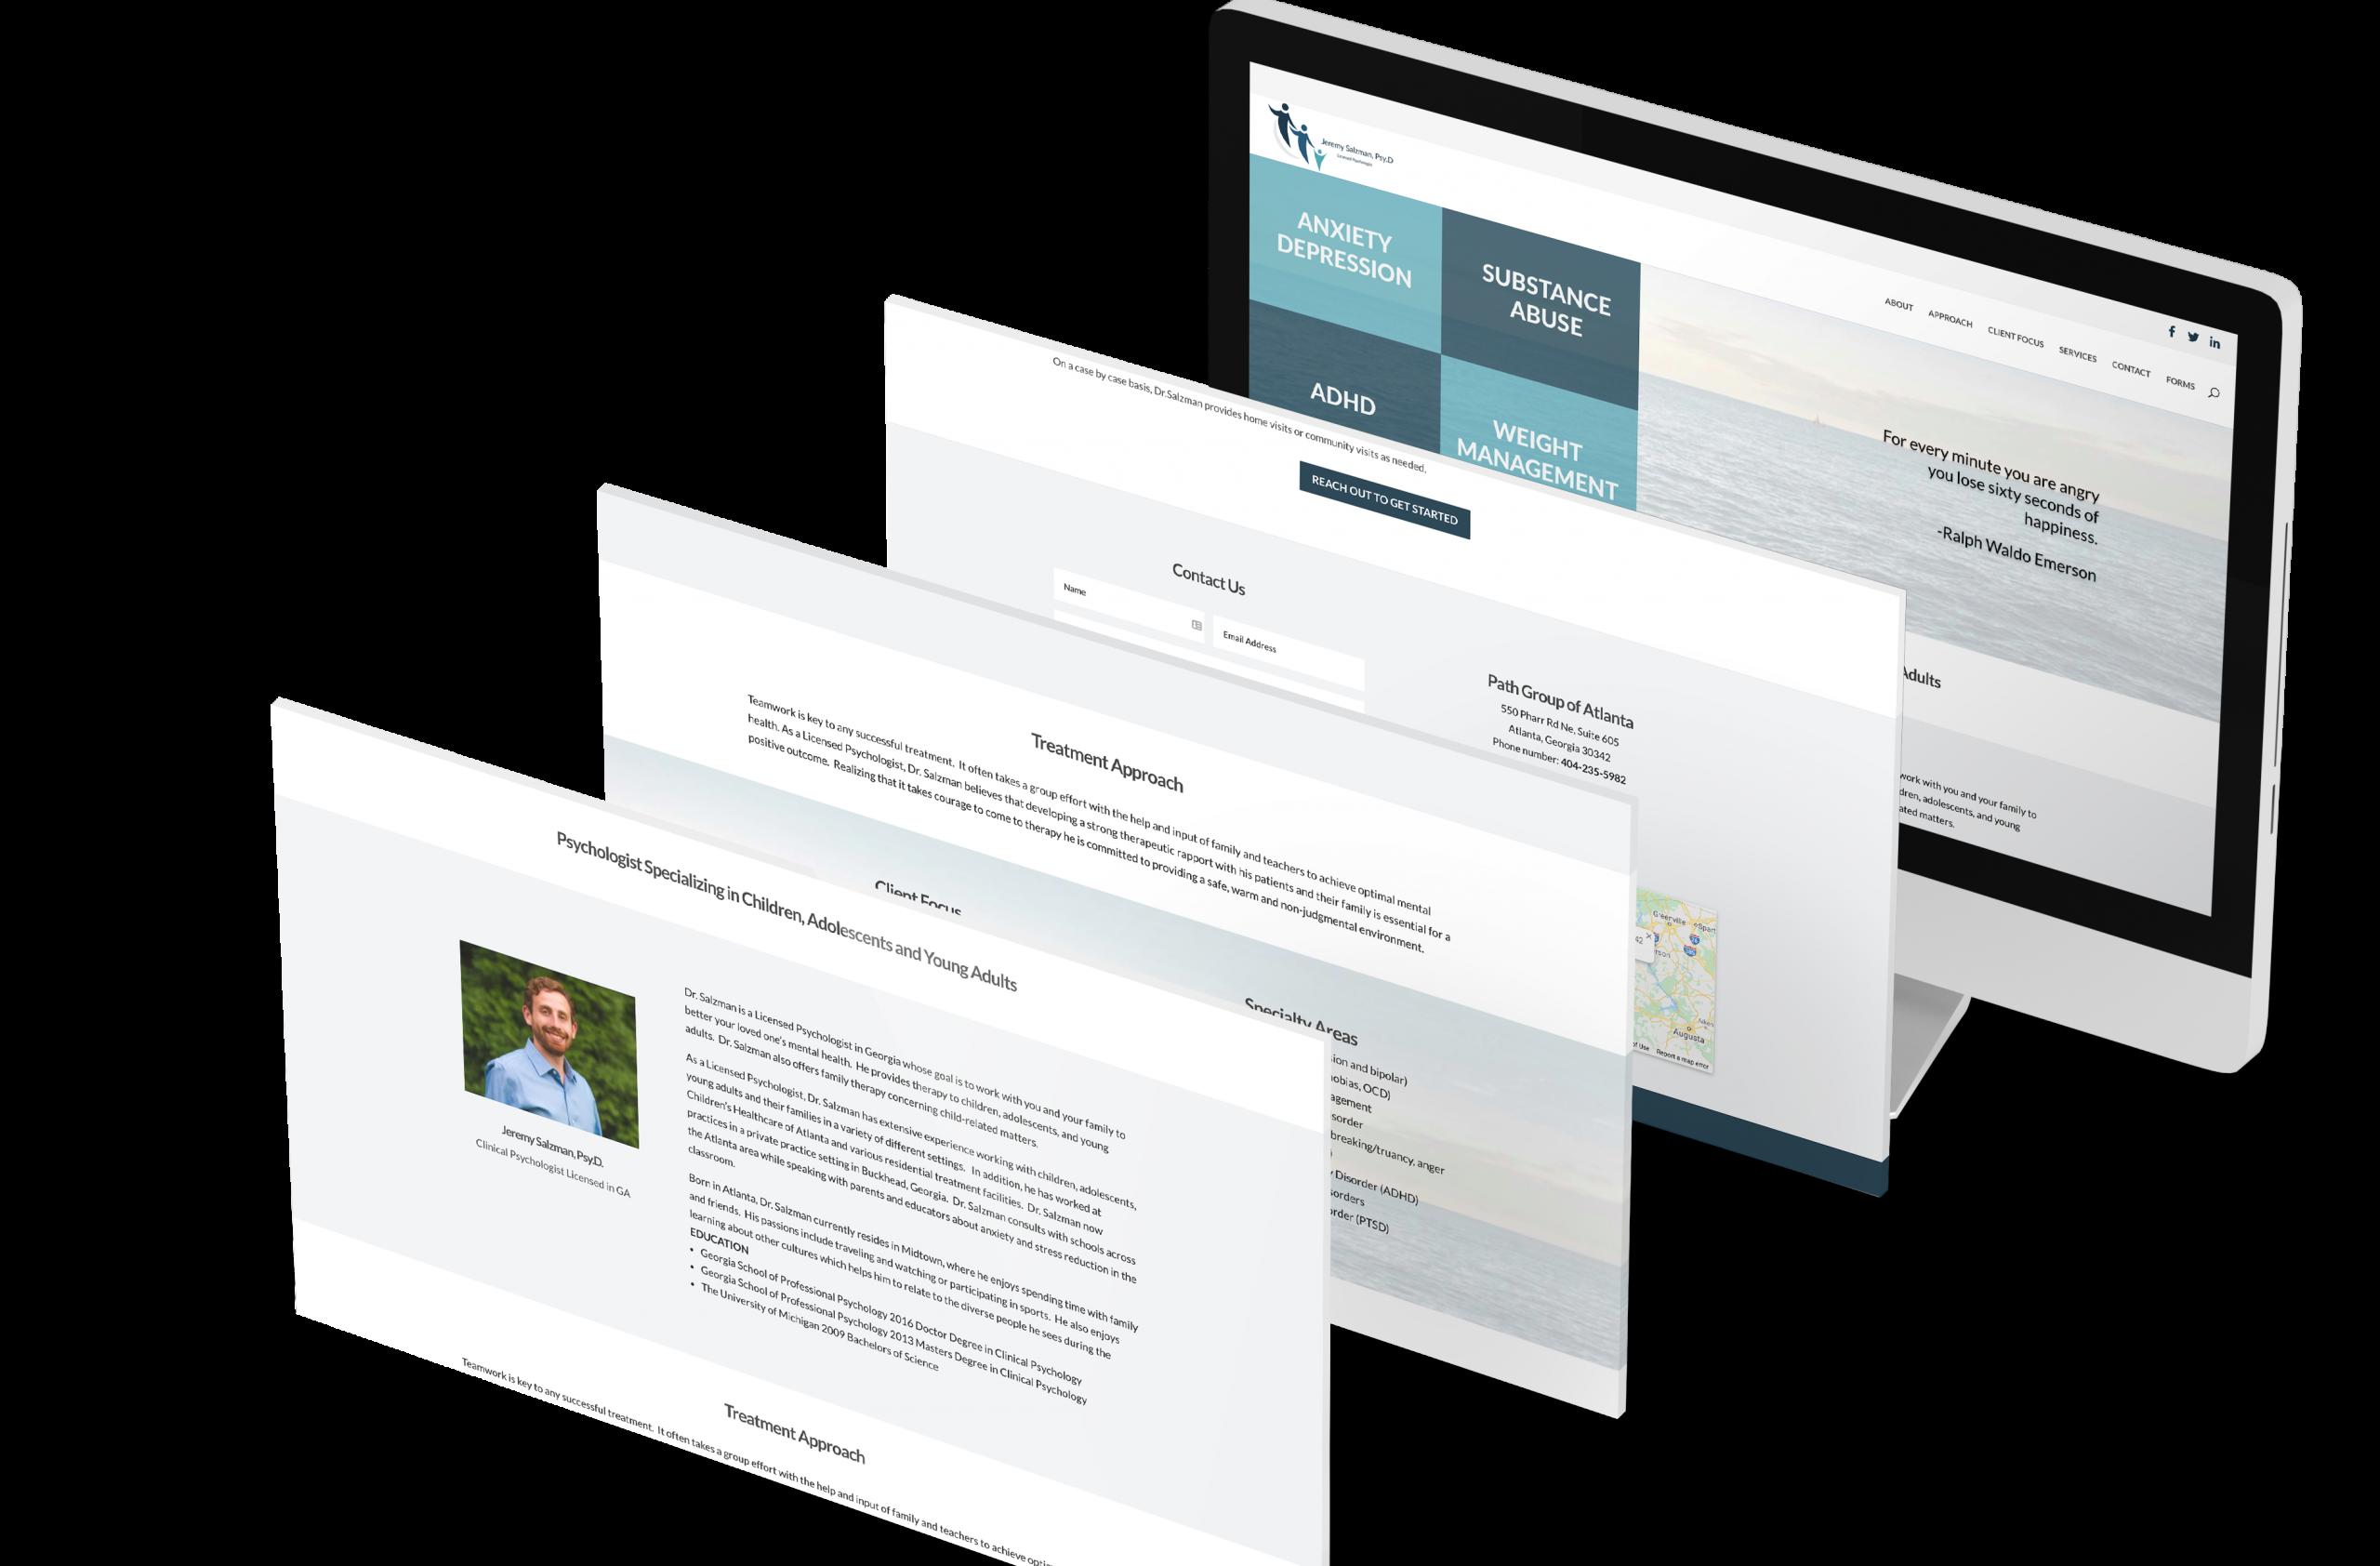 Jeremy Salzman Psy D website design built on WordPress using Divi platform